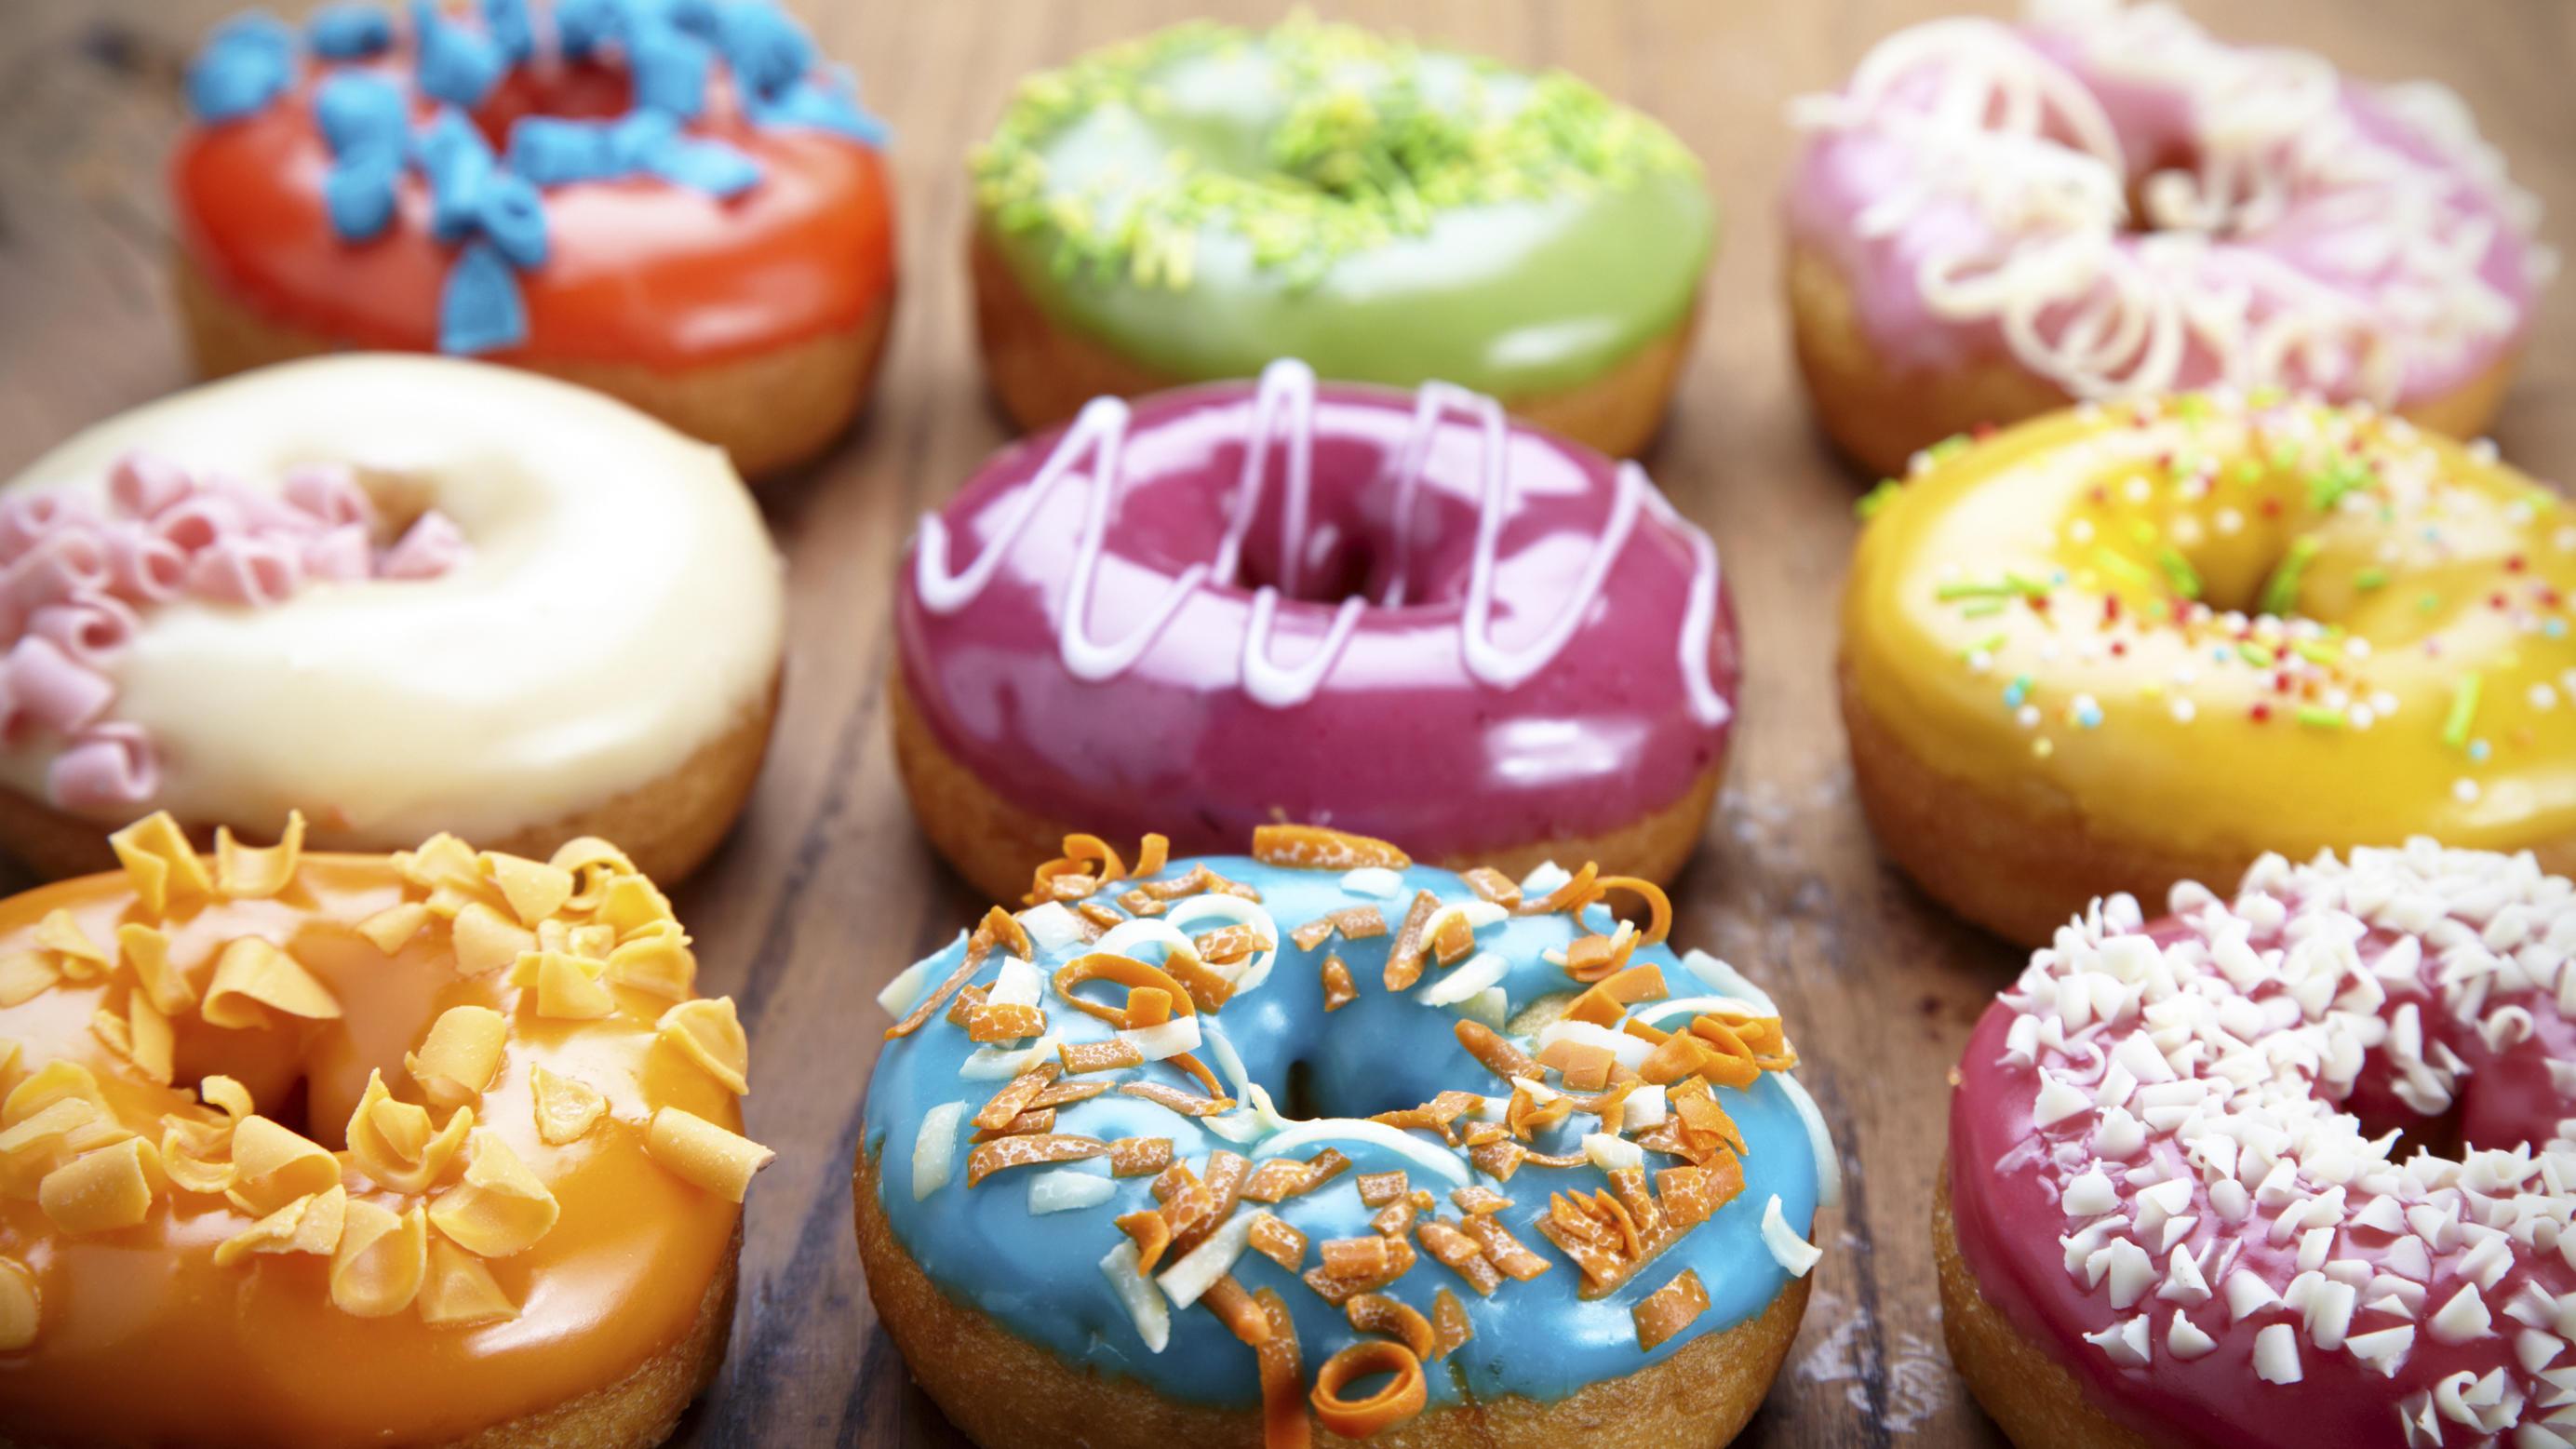 Ikea Rimforsa Kitchen Accessories ~  Test Ikea nimmt Donuts wegen Mineralöl Belastung aus dem Sortiment